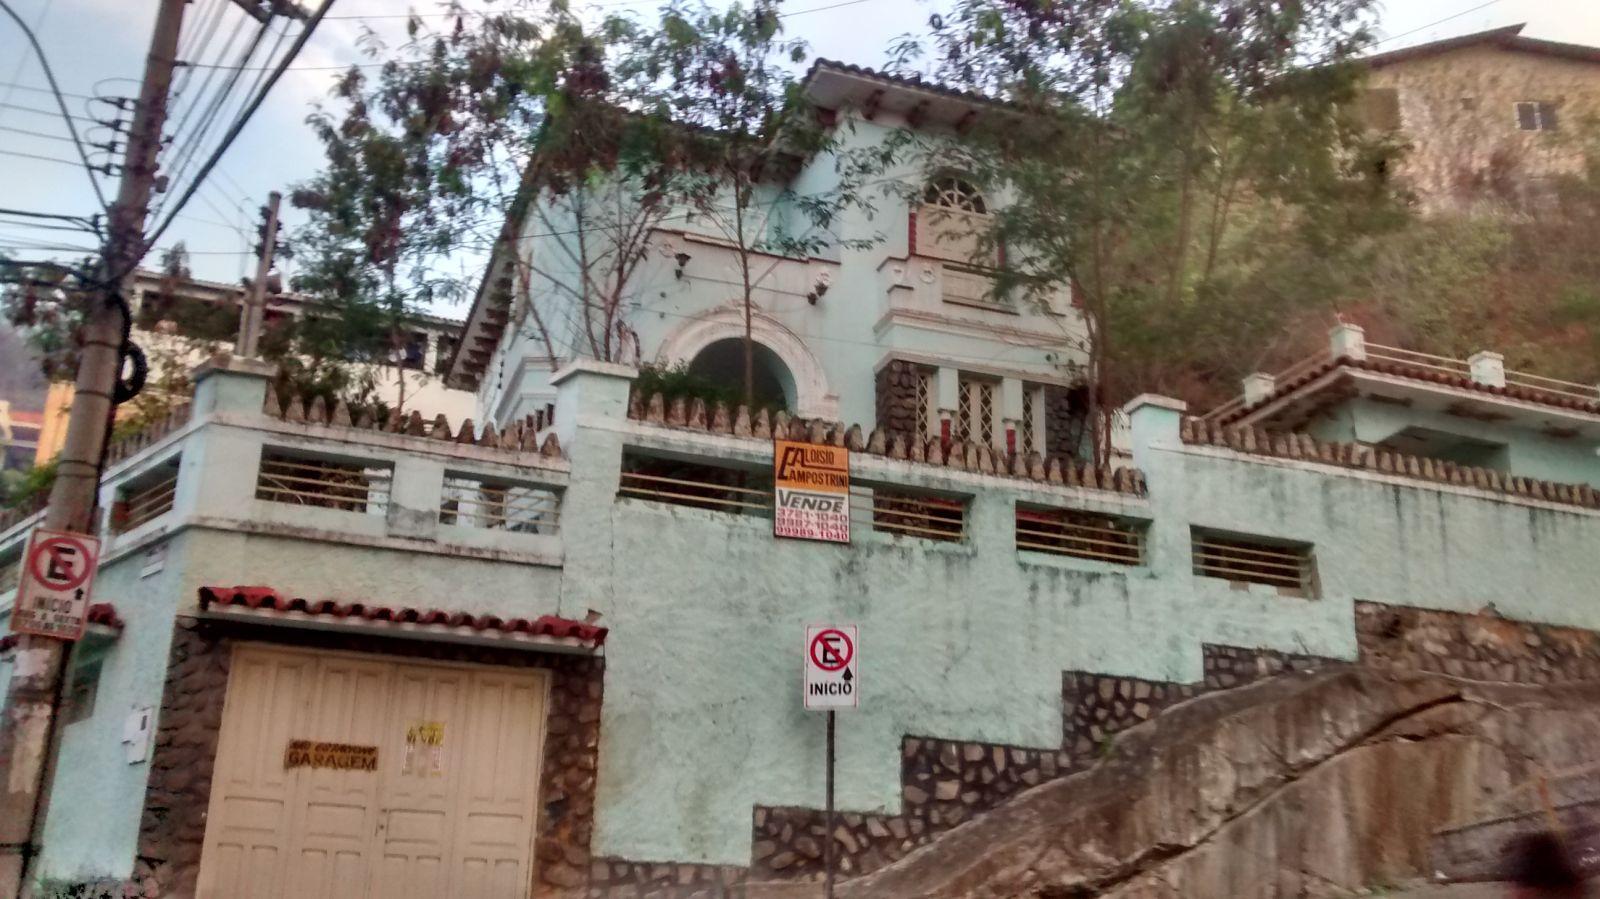 A majestosa fachada do Castelinho Colatinense